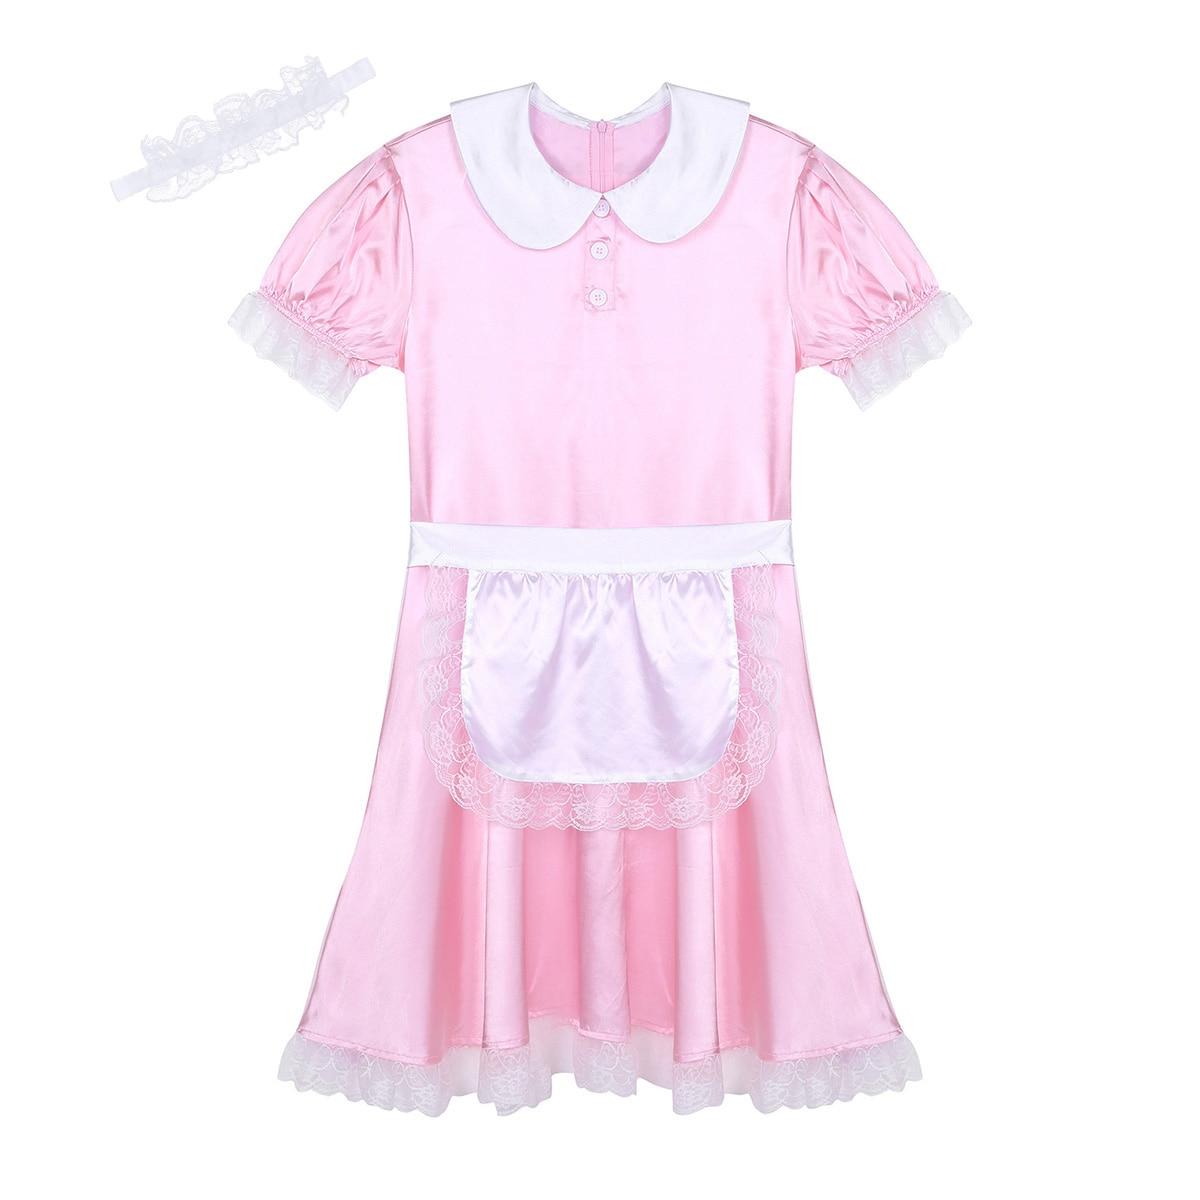 Msemis 3 Stks/set Mens Sissy Meisje Maid Lingerie Jurk Uniform Sexy Rollenspel Kostuum Satijnen Jurk Met Hoofdband En Schort Pop Hals